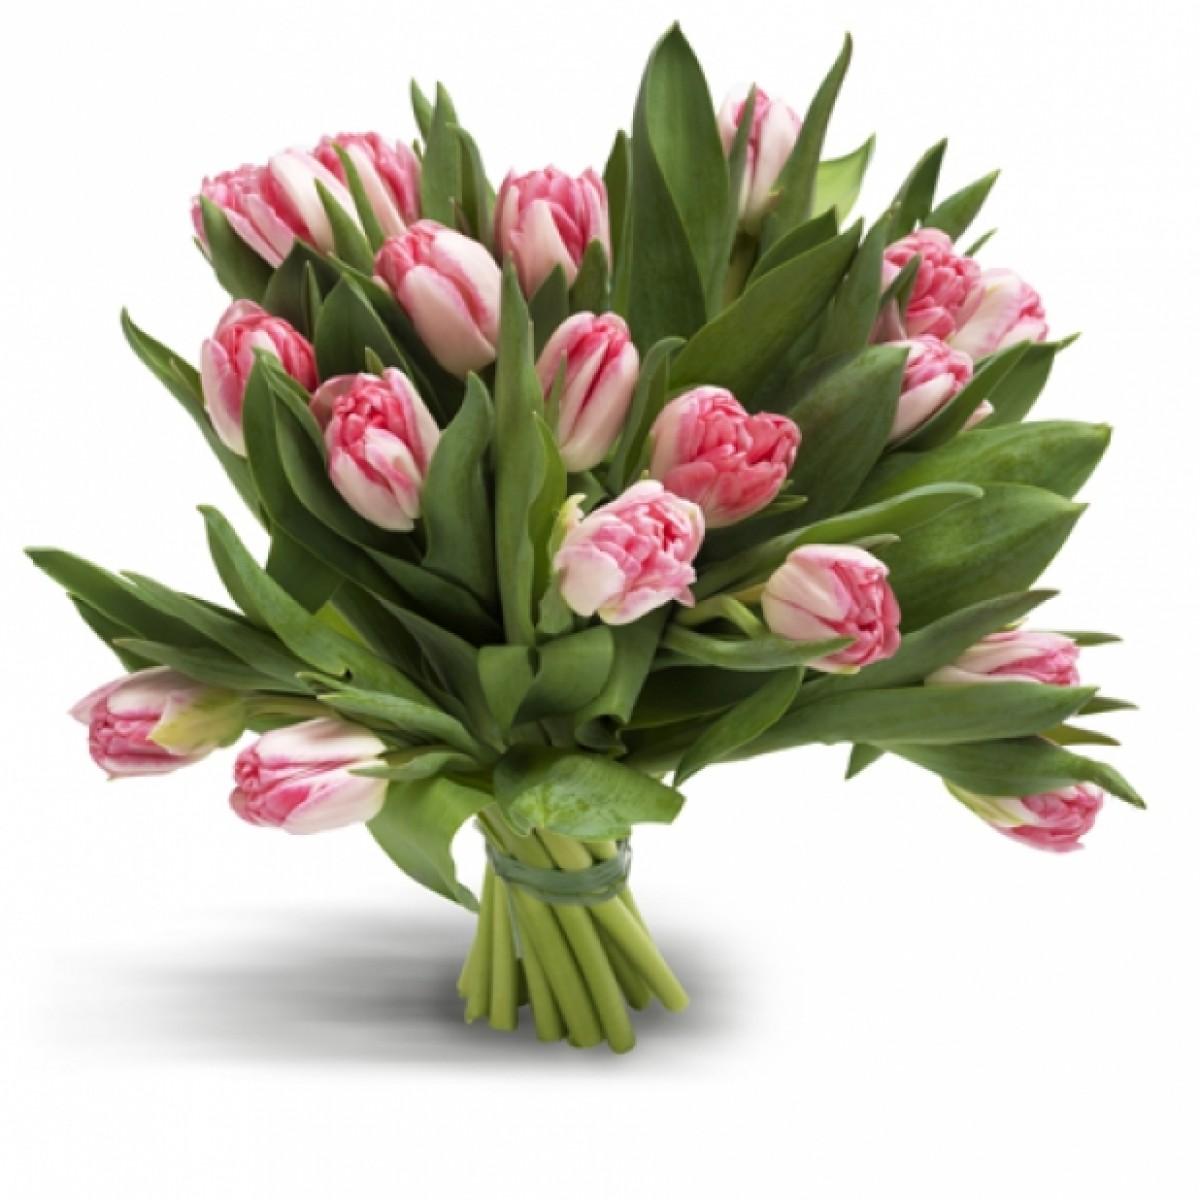 19 розови лалета